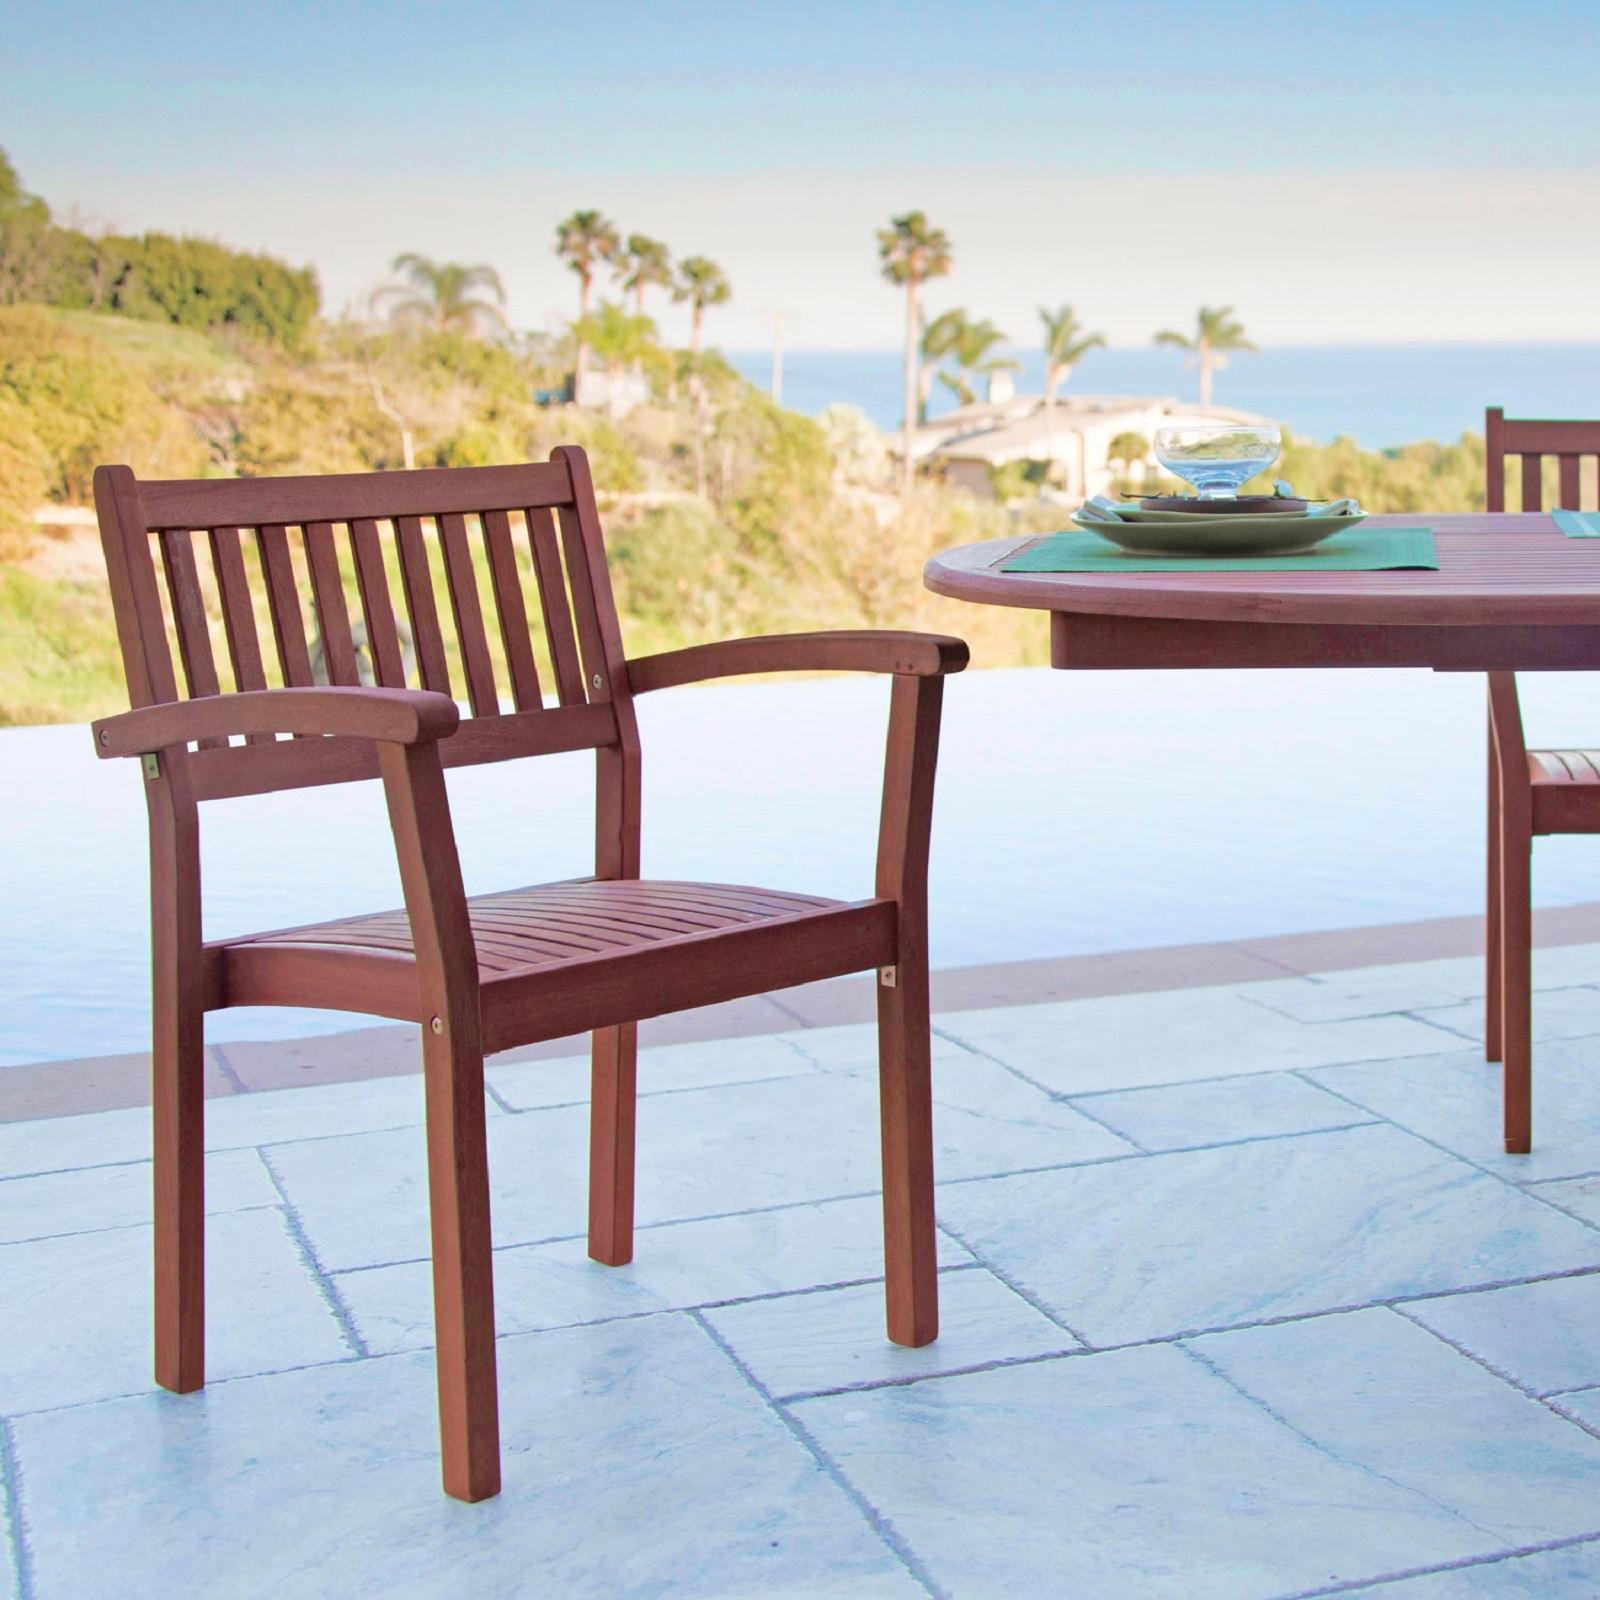 Malibu Outdoor Garden Stacking Armchair (Set of 4)